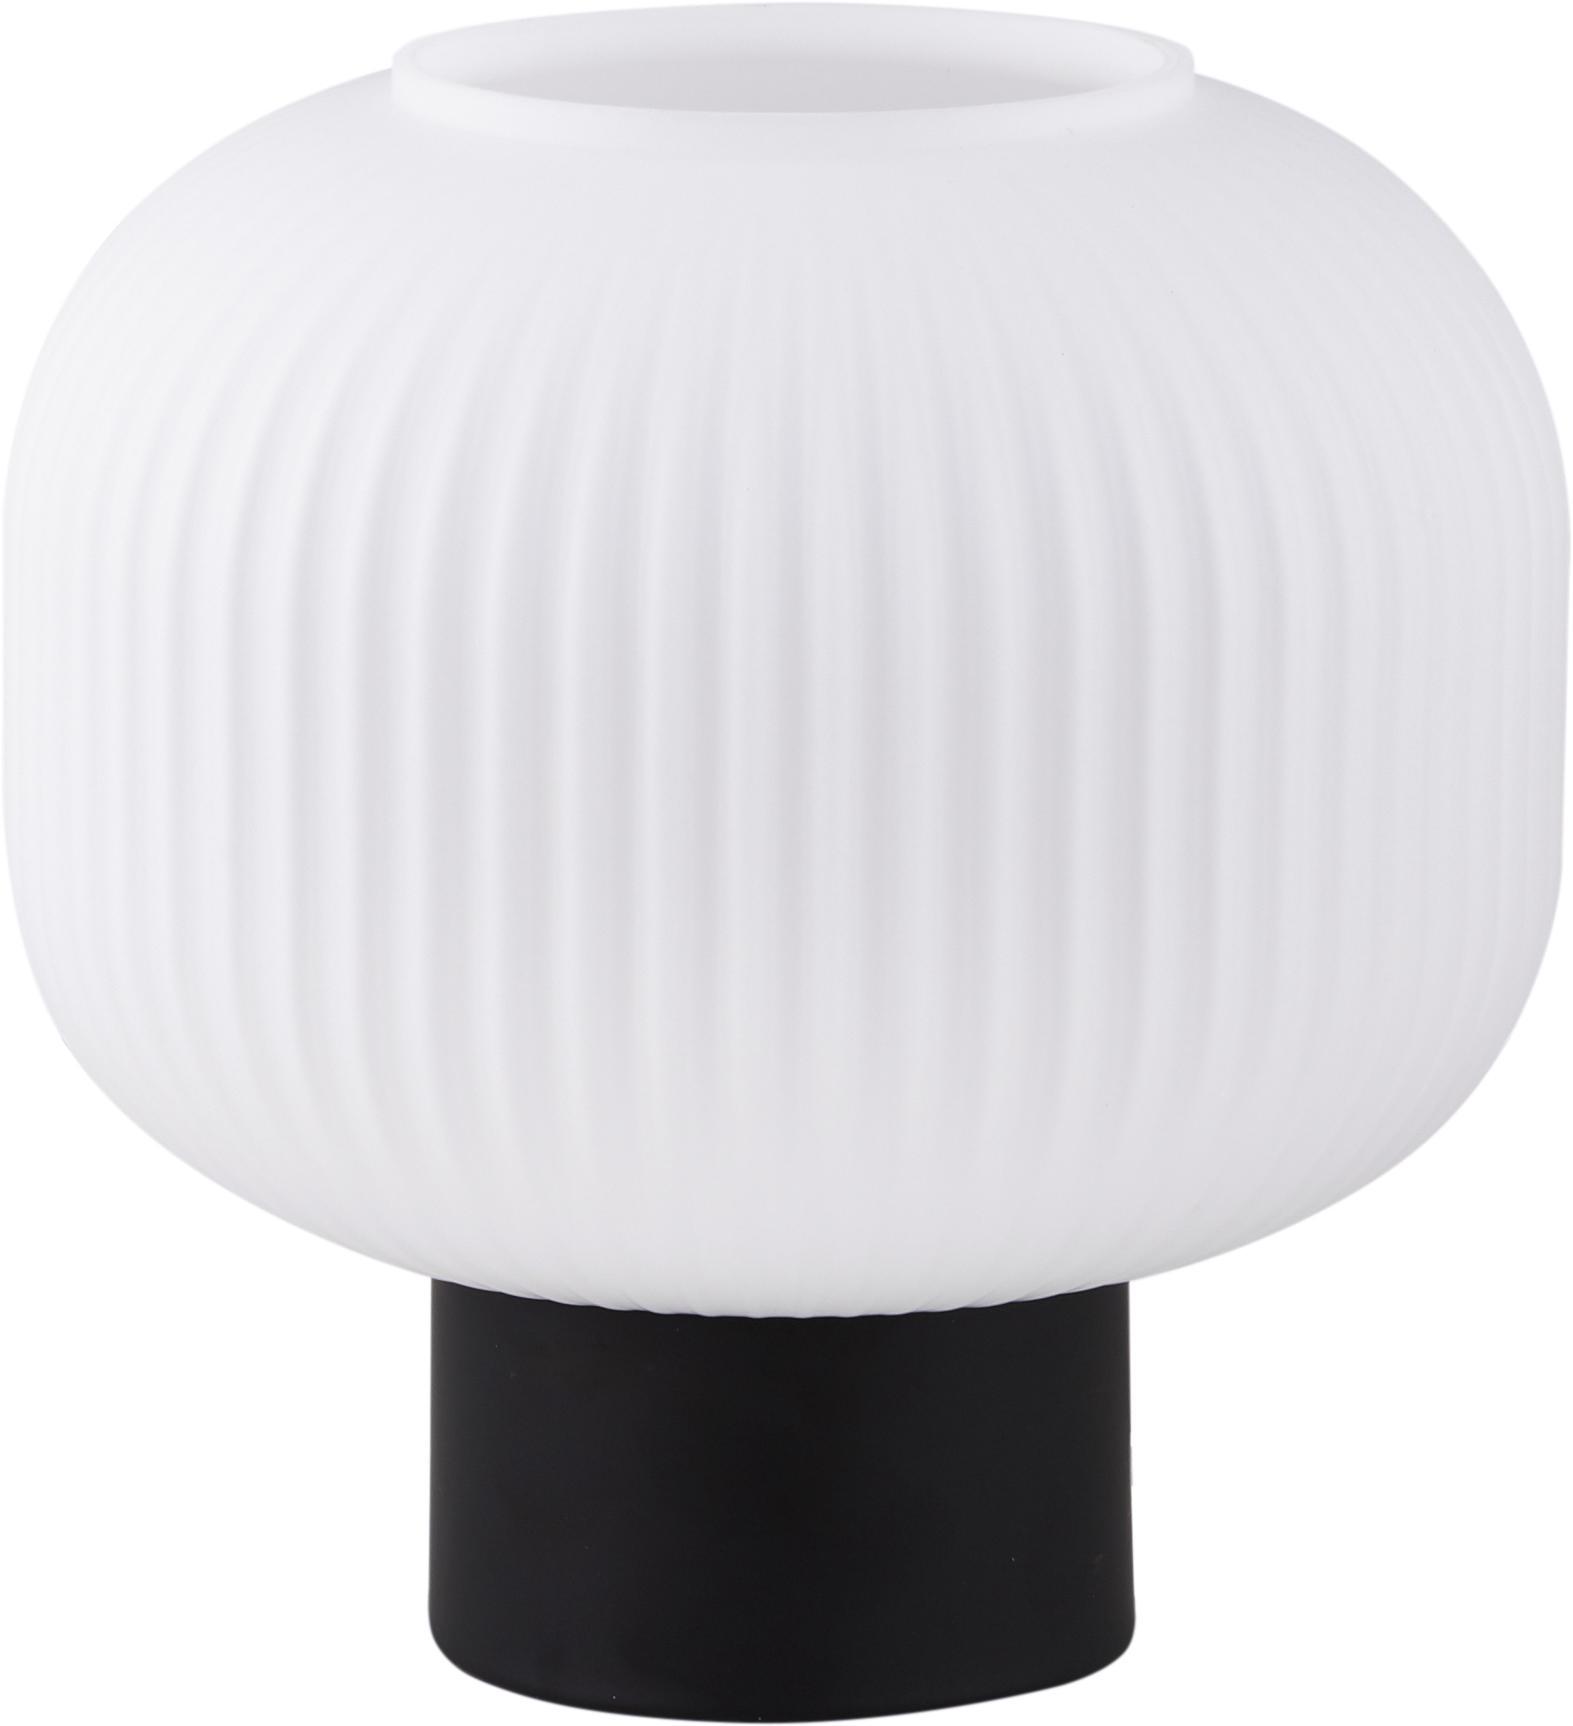 Tischlampe Charlie aus Opalglas, Lampenschirm: Opalglas, Lampenfuß: Metall, beschichtet, Schwarz, Opalweiß, Ø 20 x H 20 cm